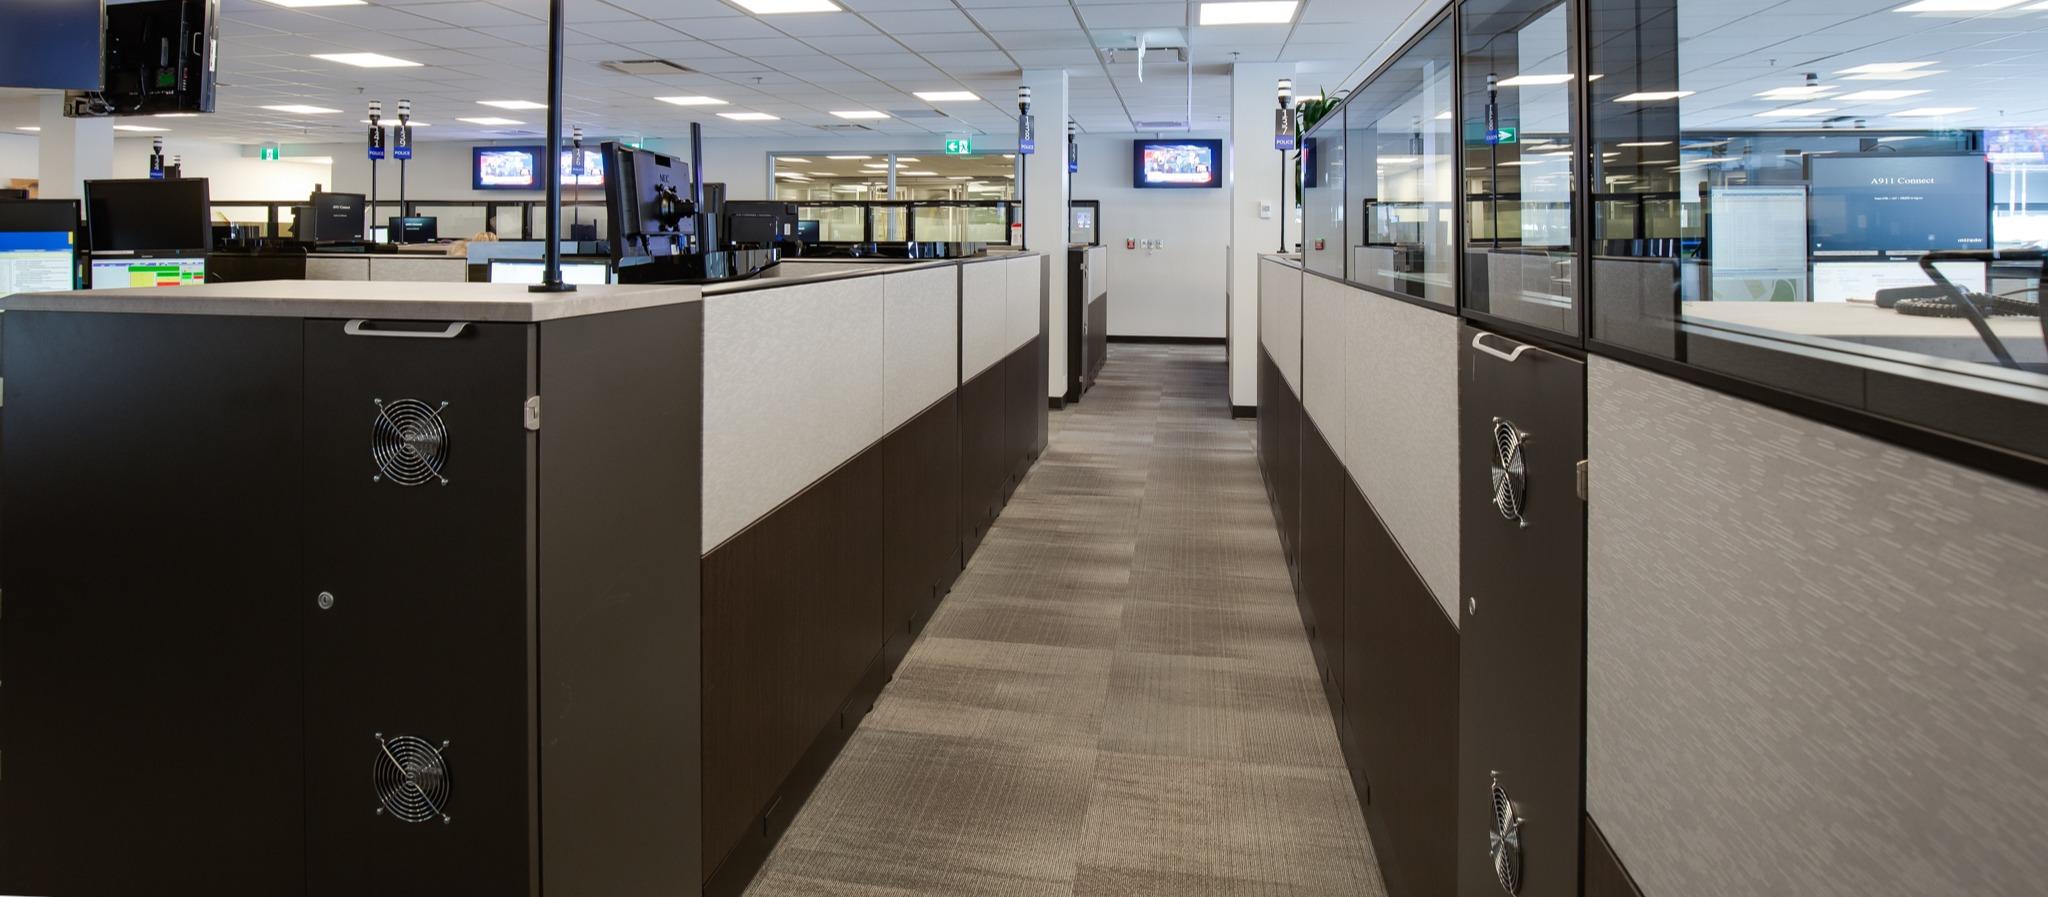 Panel Tiles in a Comm Center - Xybix